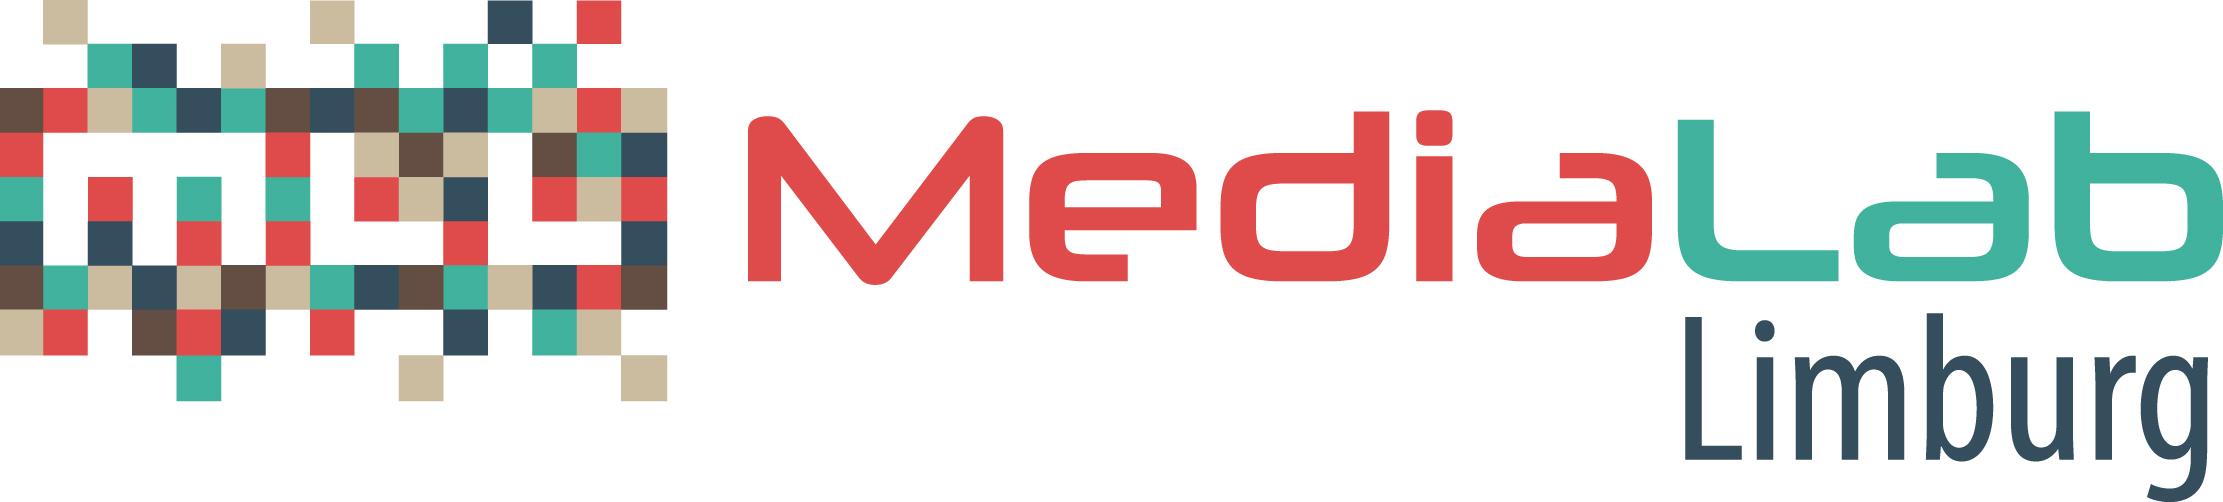 Medialab Limburg